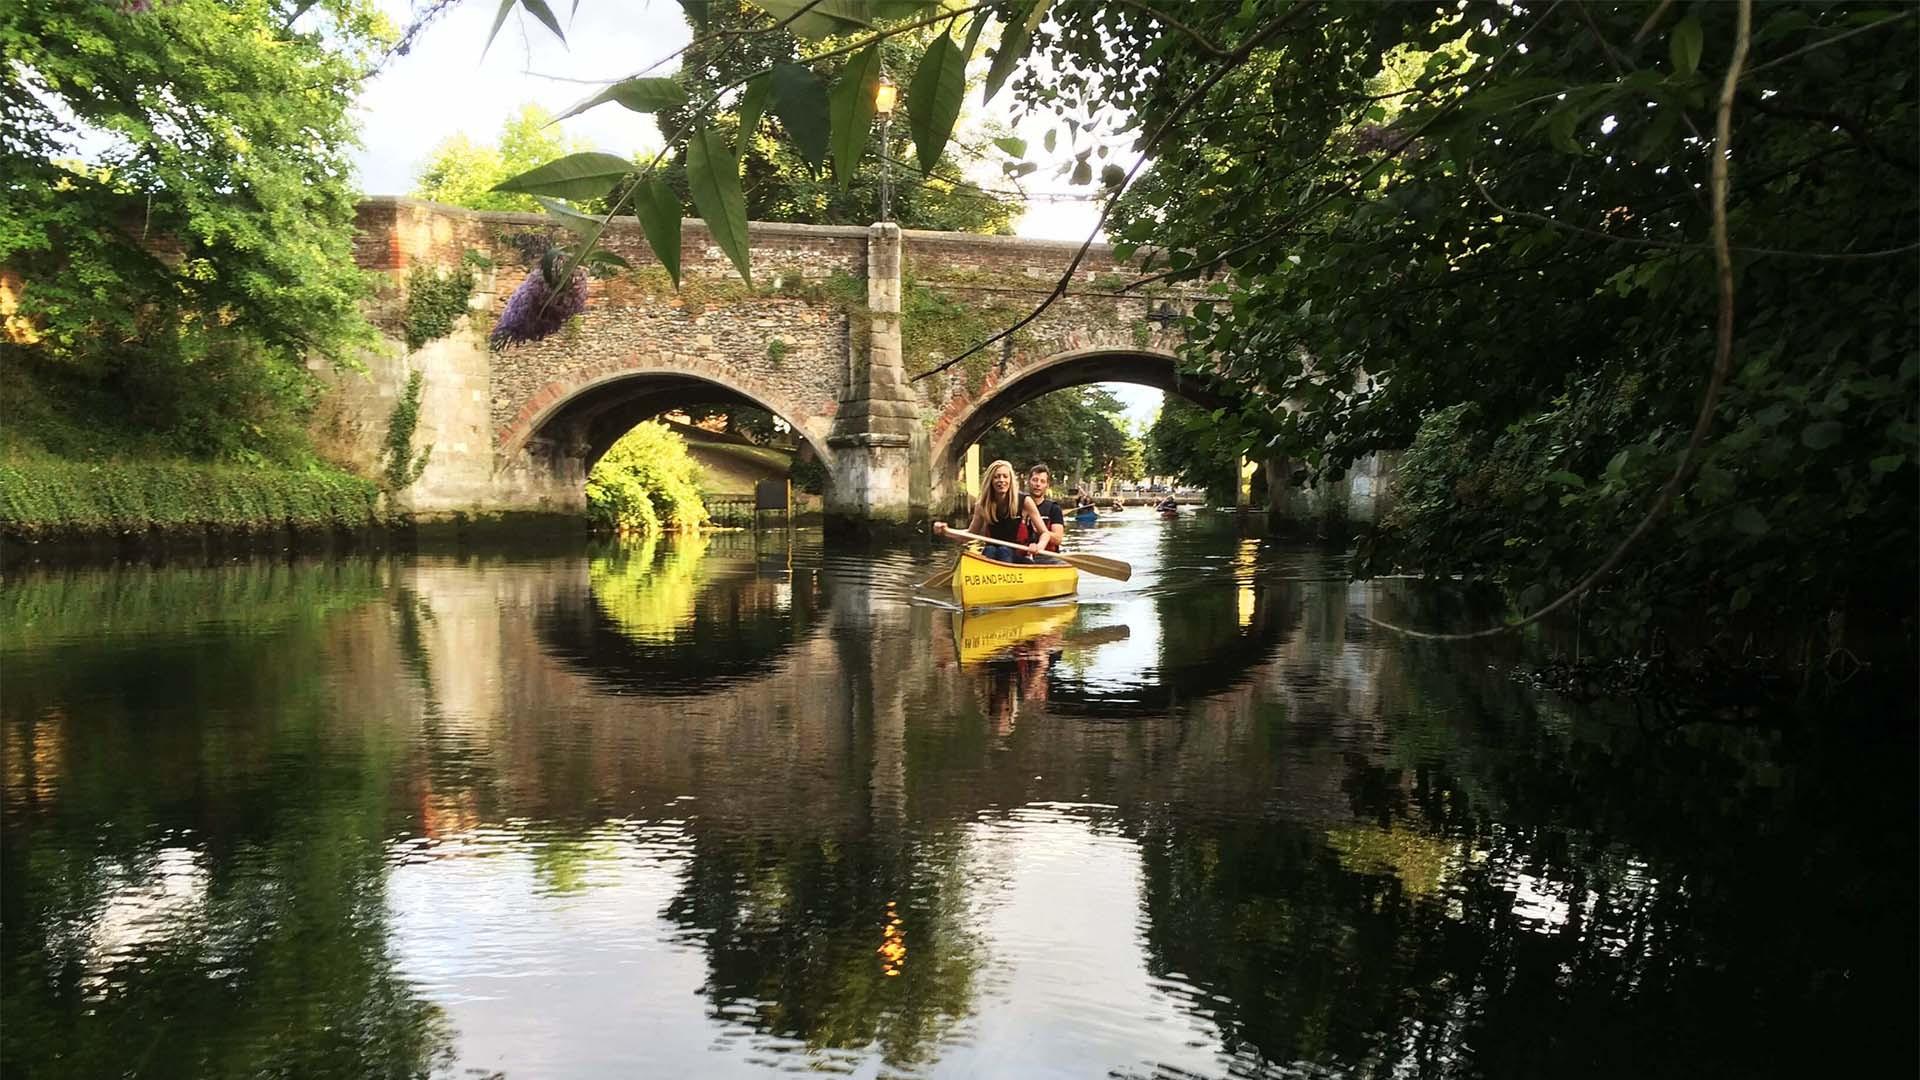 Pub & Paddle canoe tour in Norfolk